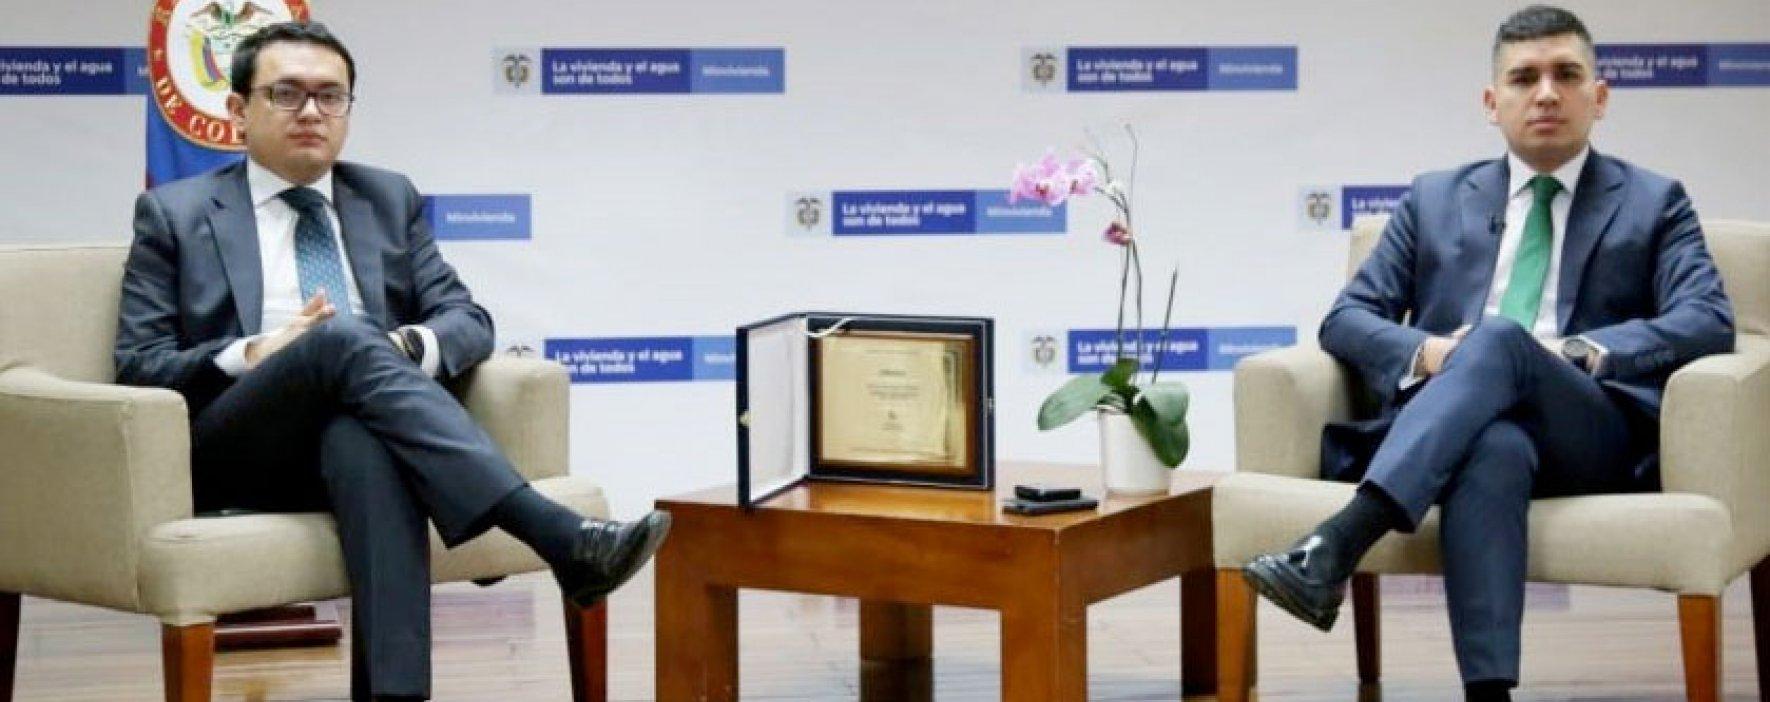 El MinVivienda recibió, desde Indonesia, el Pergamino de Honor de ONU-Hábitat